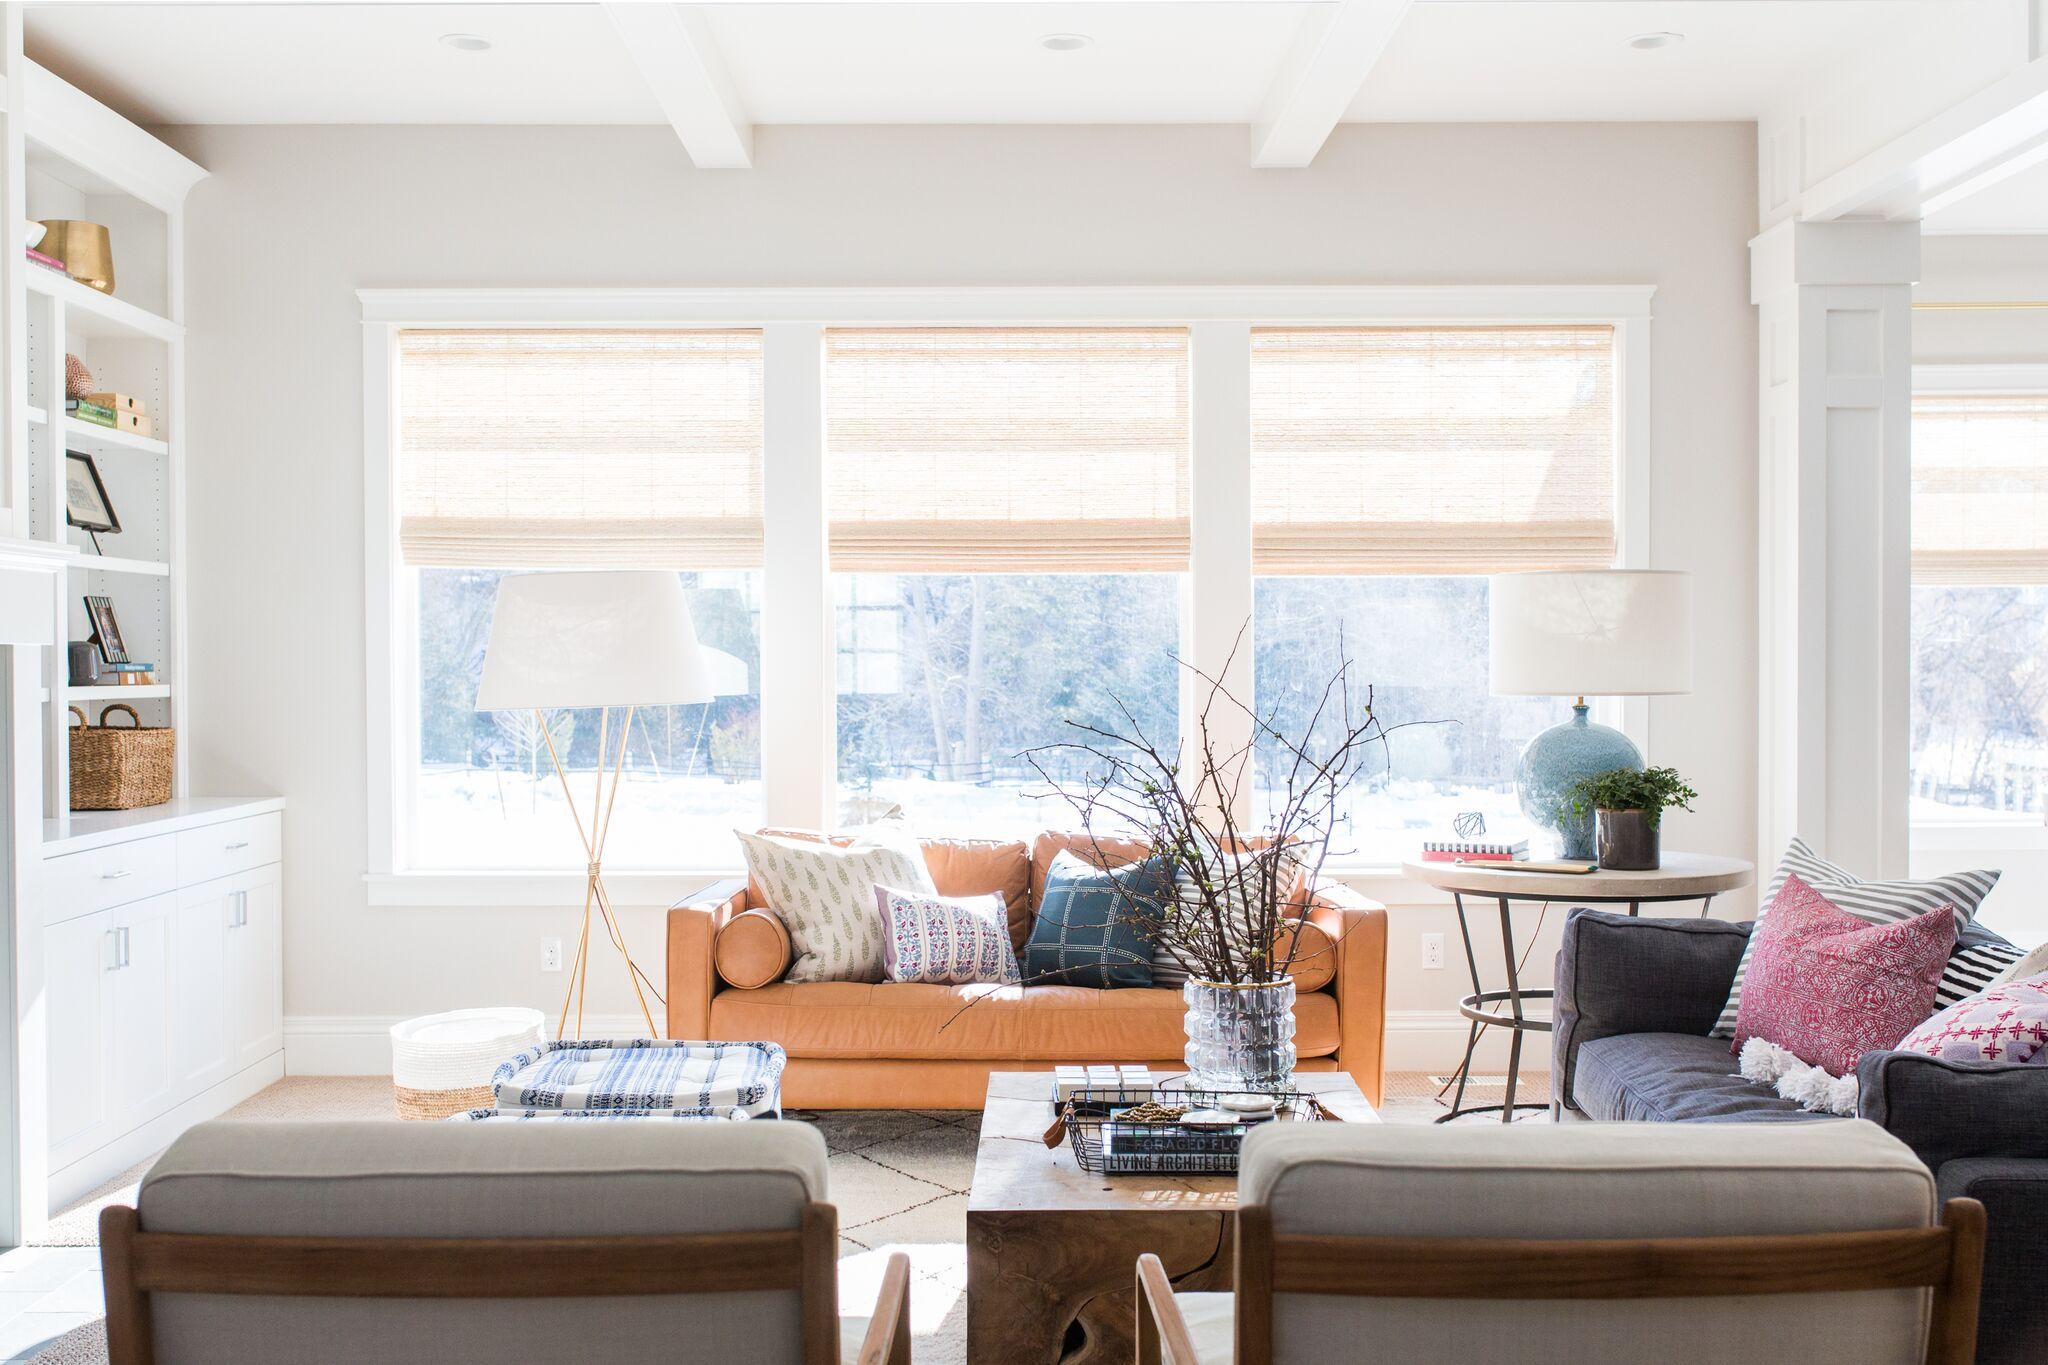 Living room with three large windows